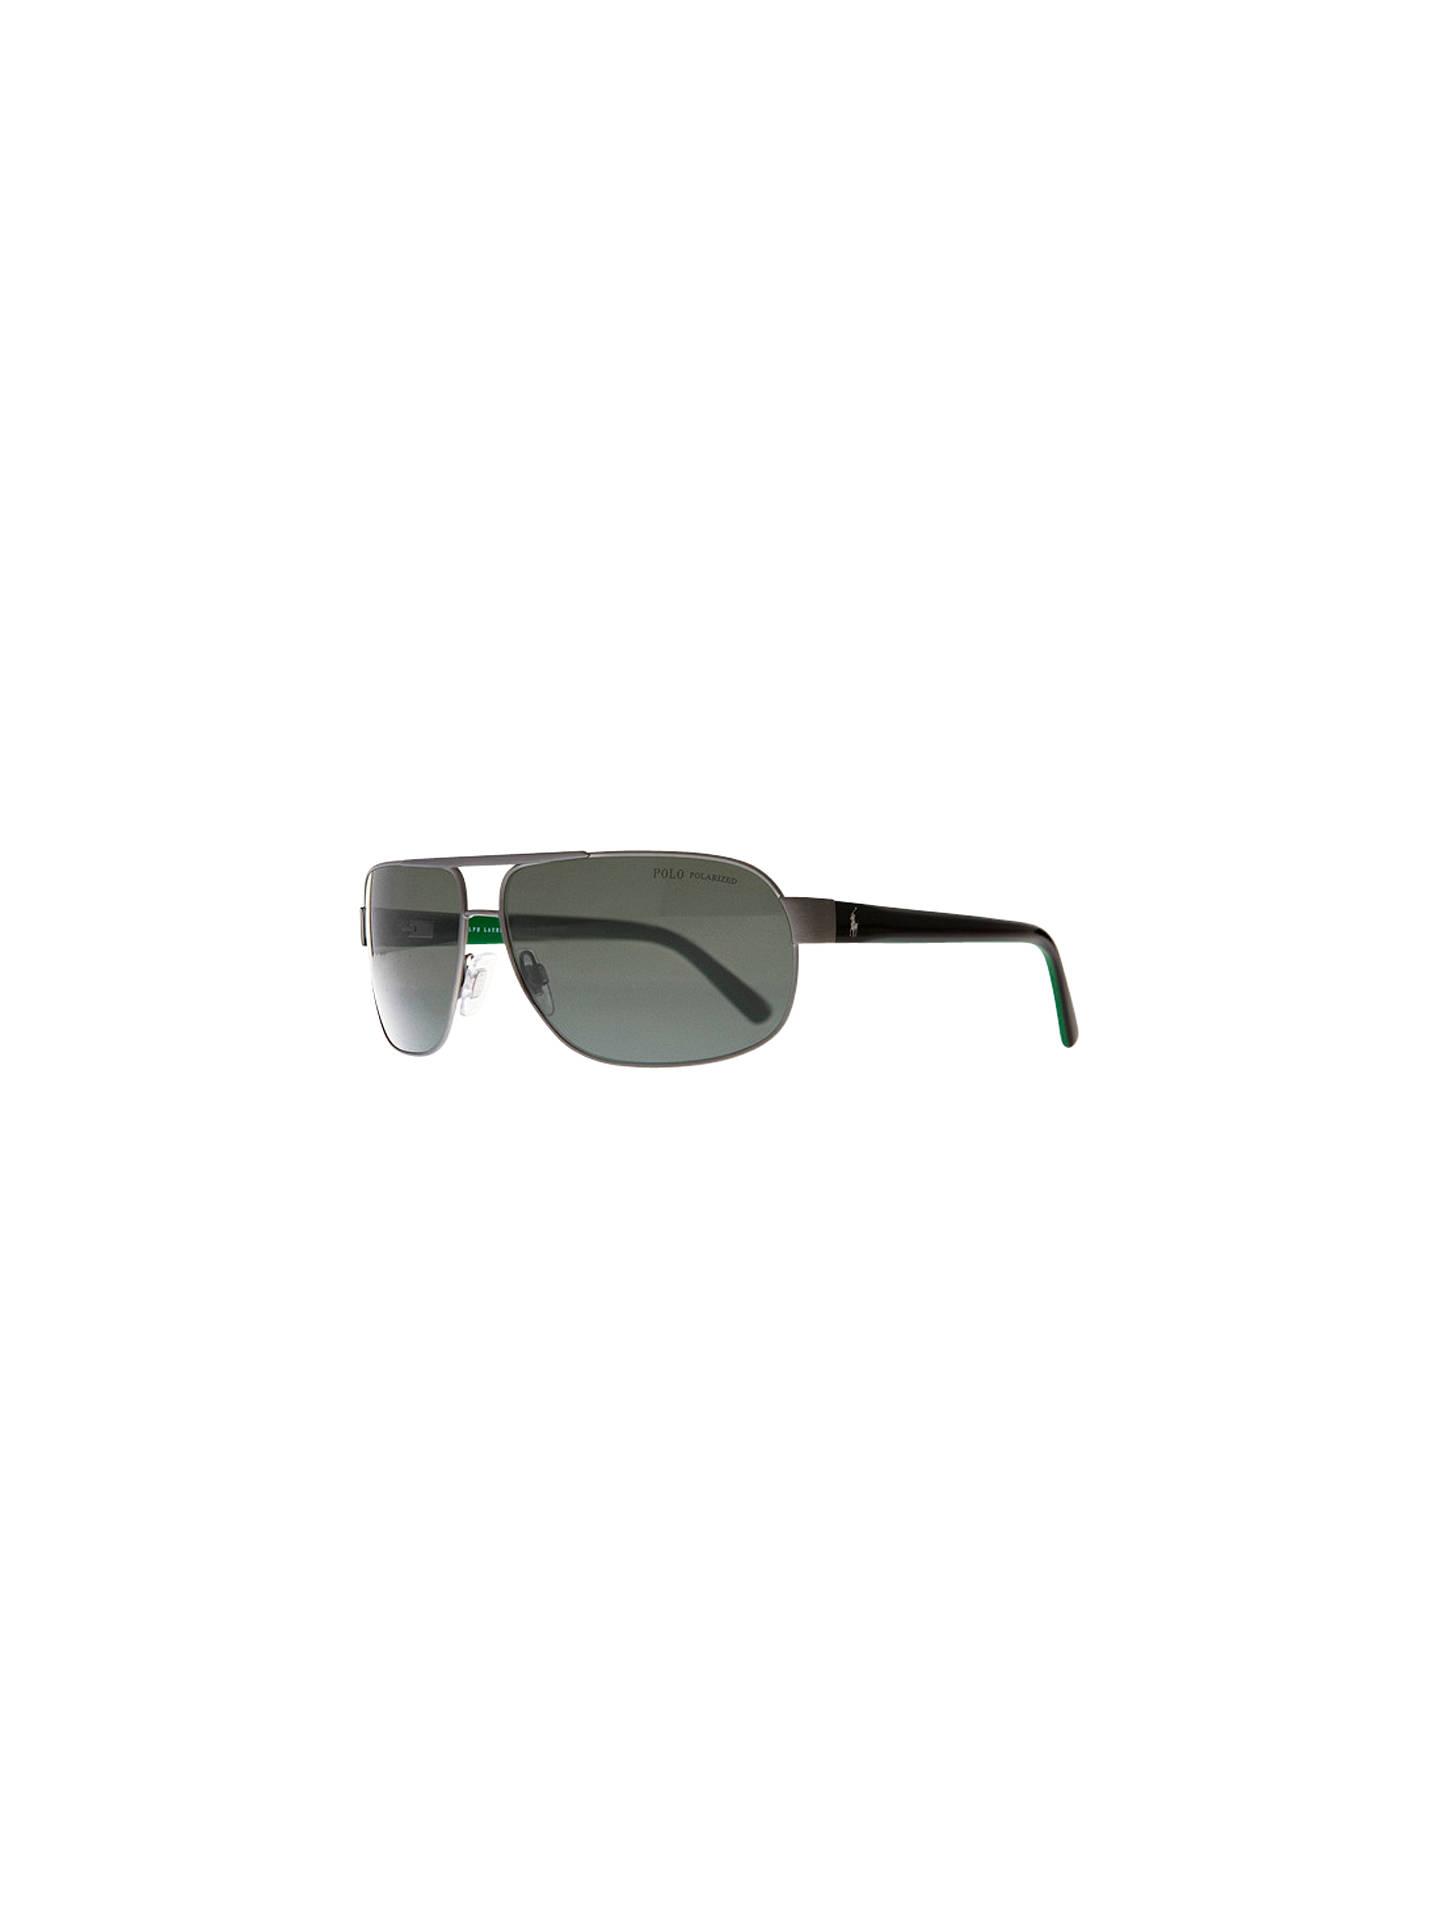 44d6865d74cd Buy Polo Ralph Lauren PH3066 Pony Player Pilot Sunglasses, Brushed Dark  Gunmetal Online at johnlewis ...